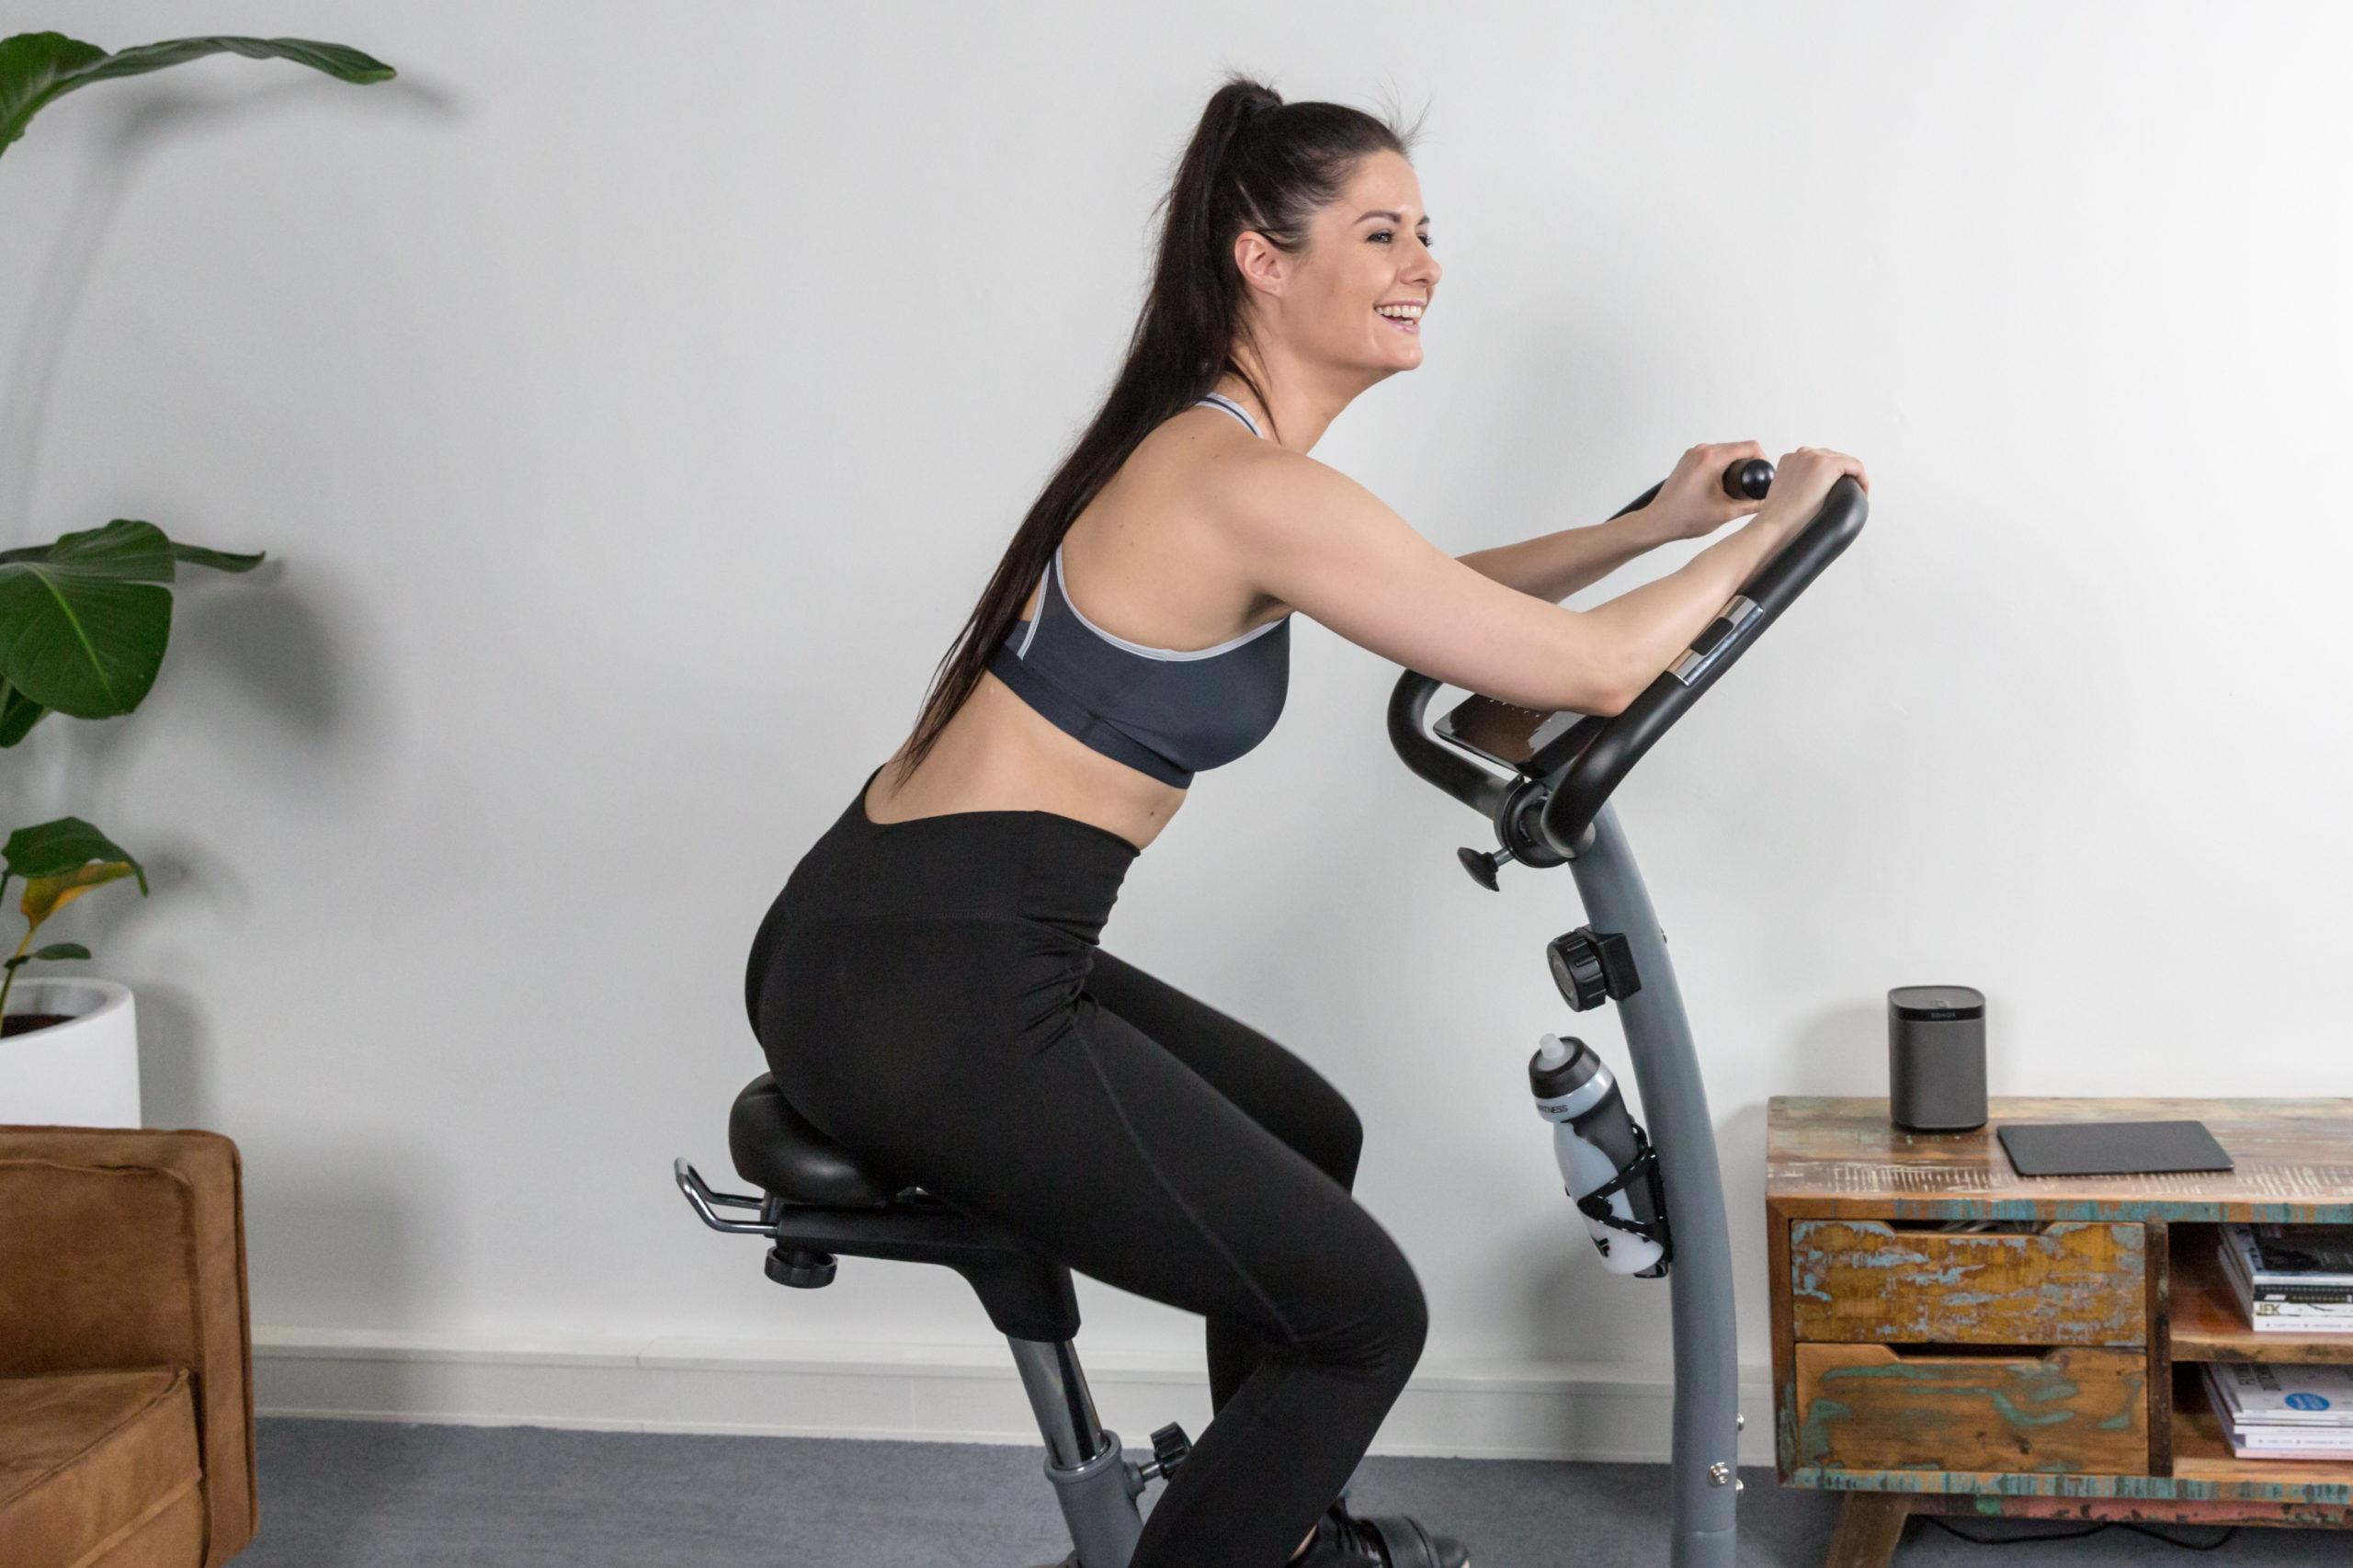 Flow Fitness Tabel Turner DHT500 Hometrainer 12